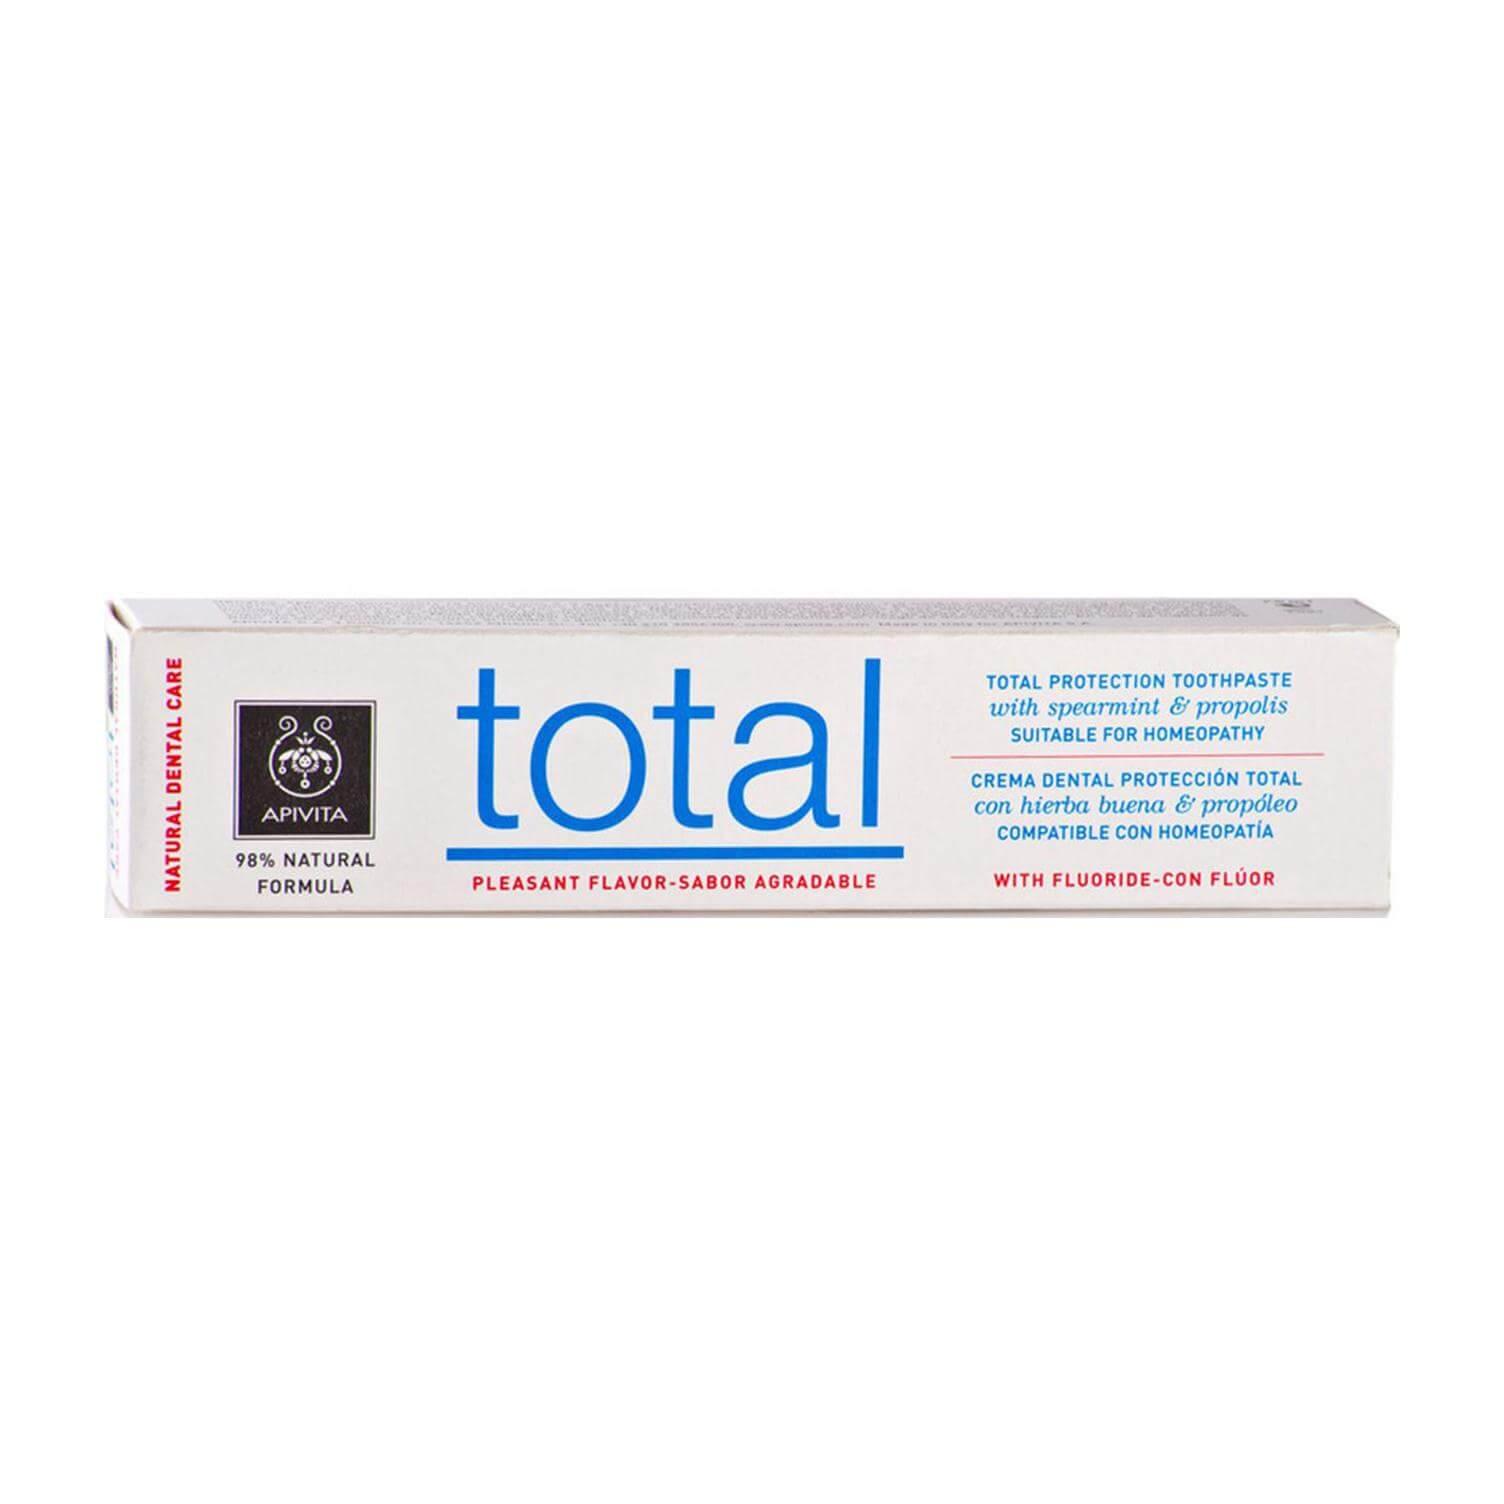 Apivita Natural Dental Care Total Οδοντόκρεμα Για Ολοκληρωμένη Προστασία Με Πρόπολη & Δυόσμο 75ml